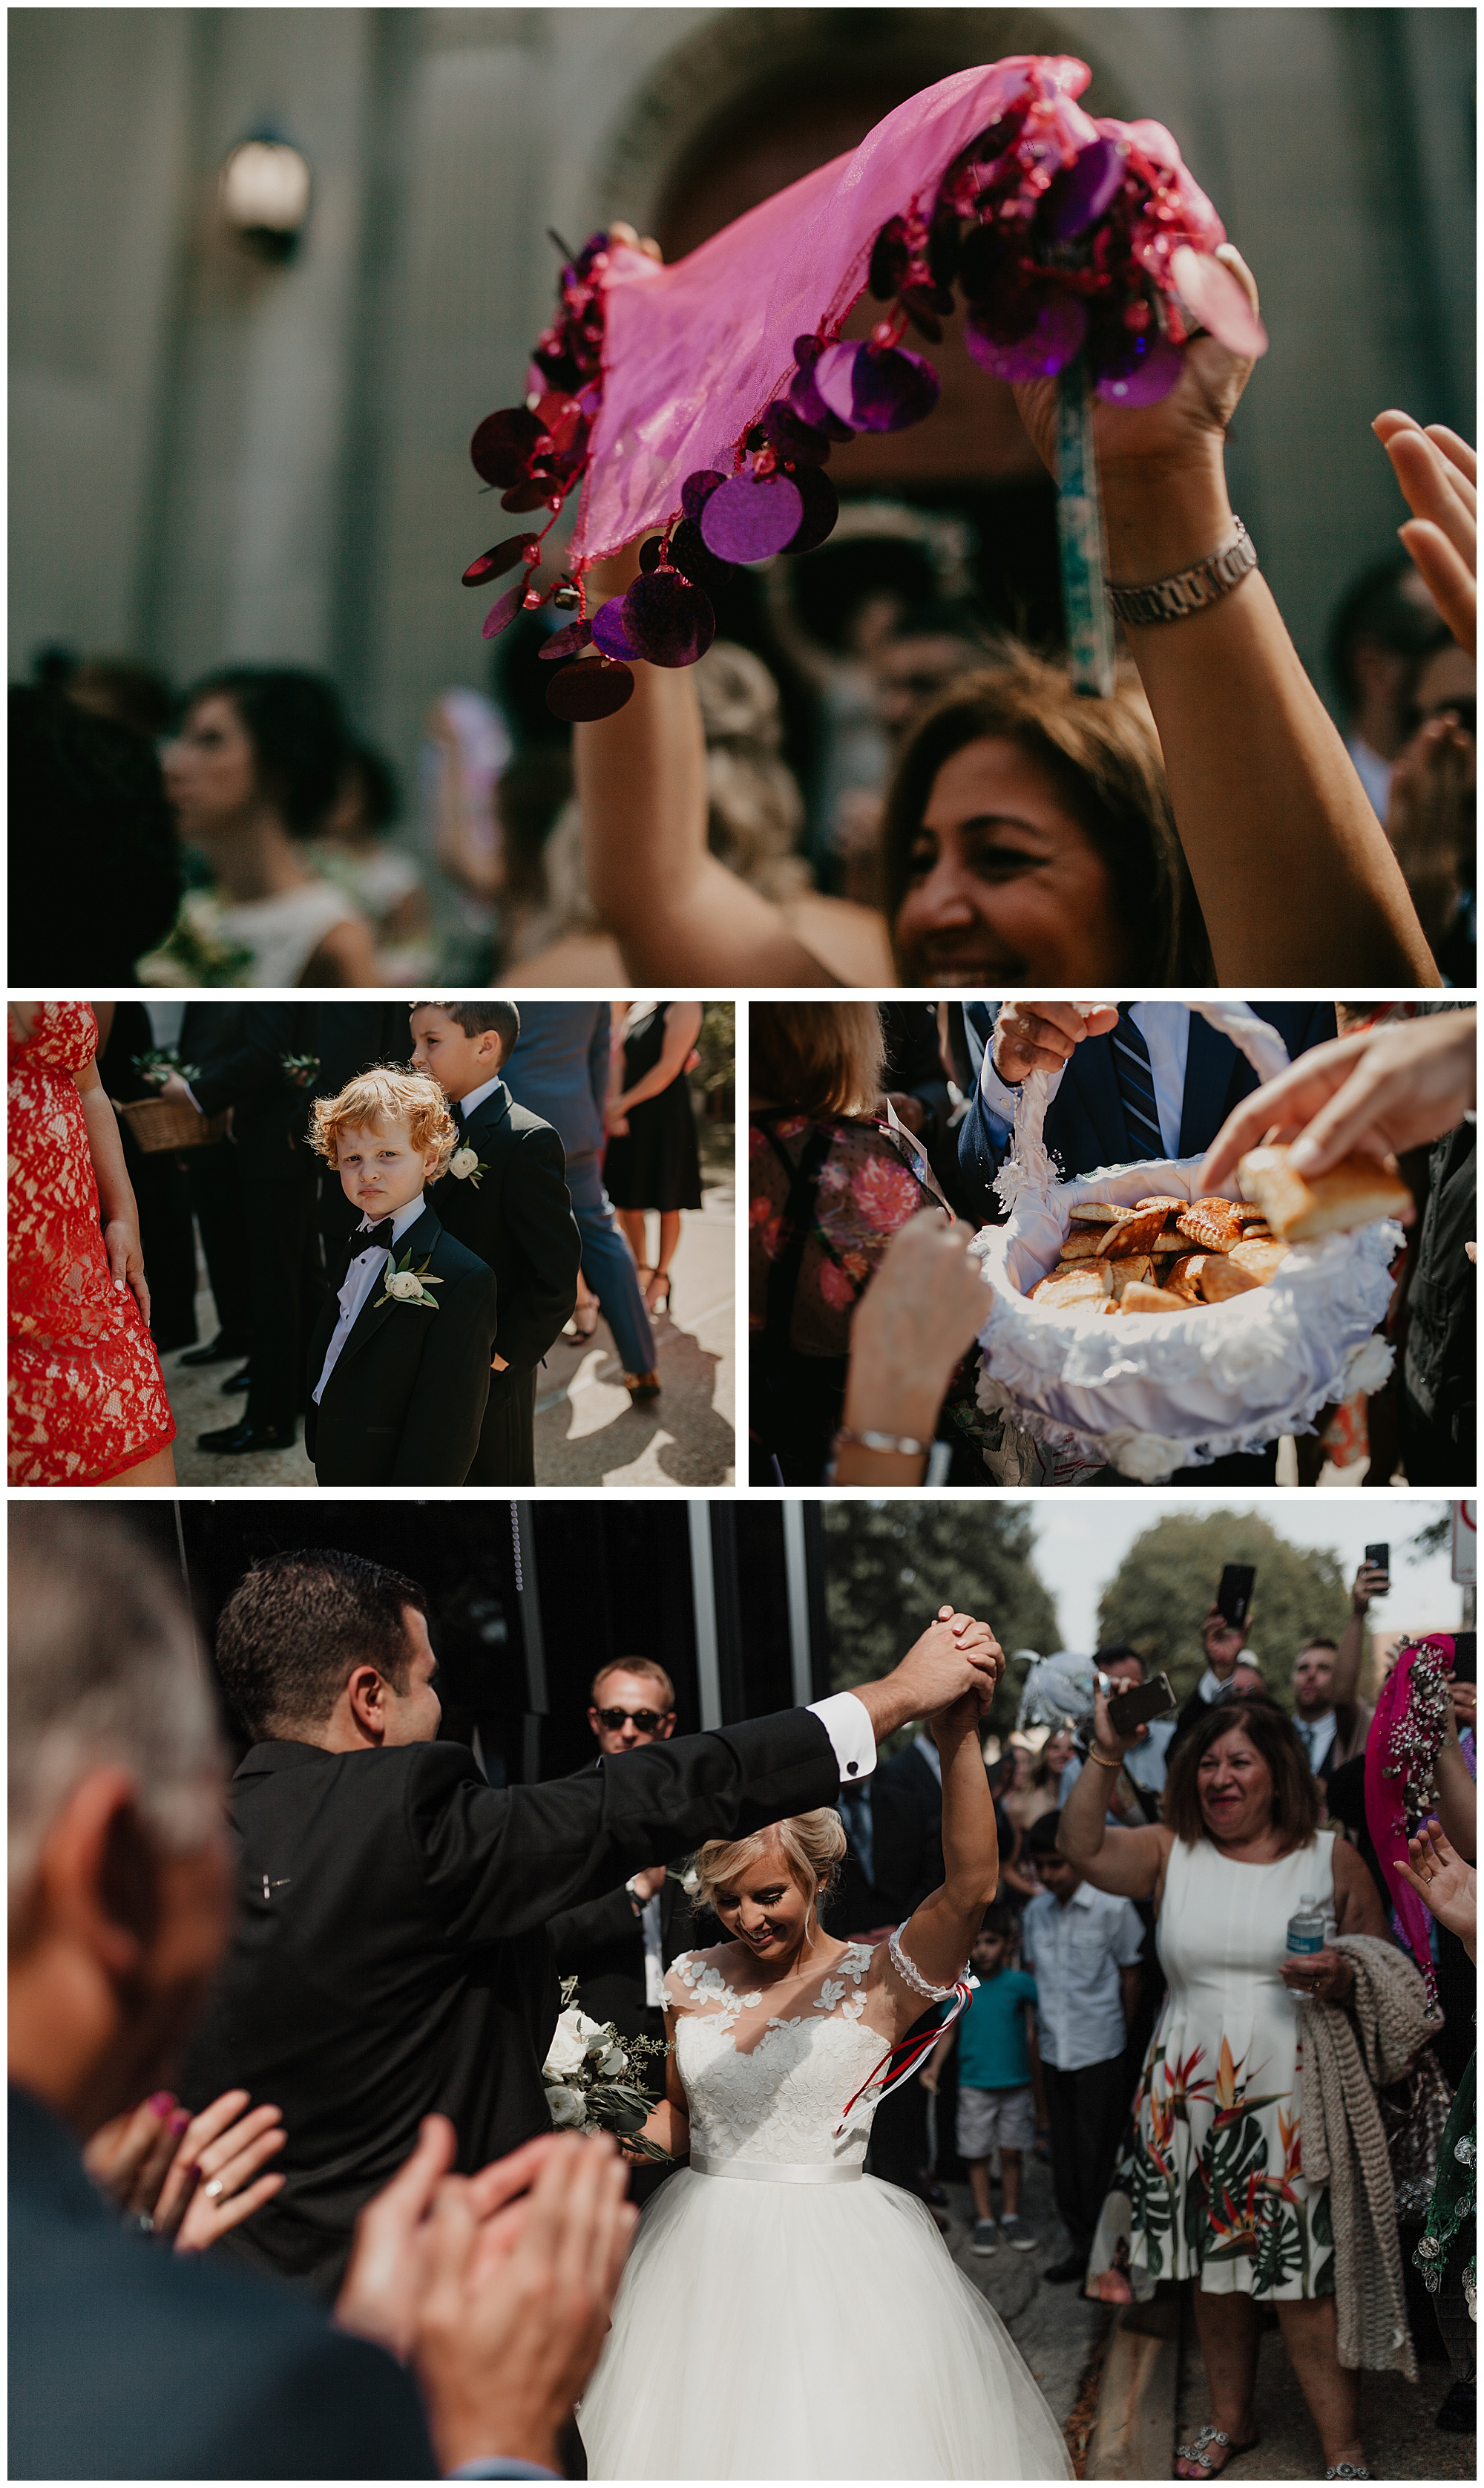 pear_tree_estate_wedding_champaign_il_wright_photographs_jj_0008.jpg